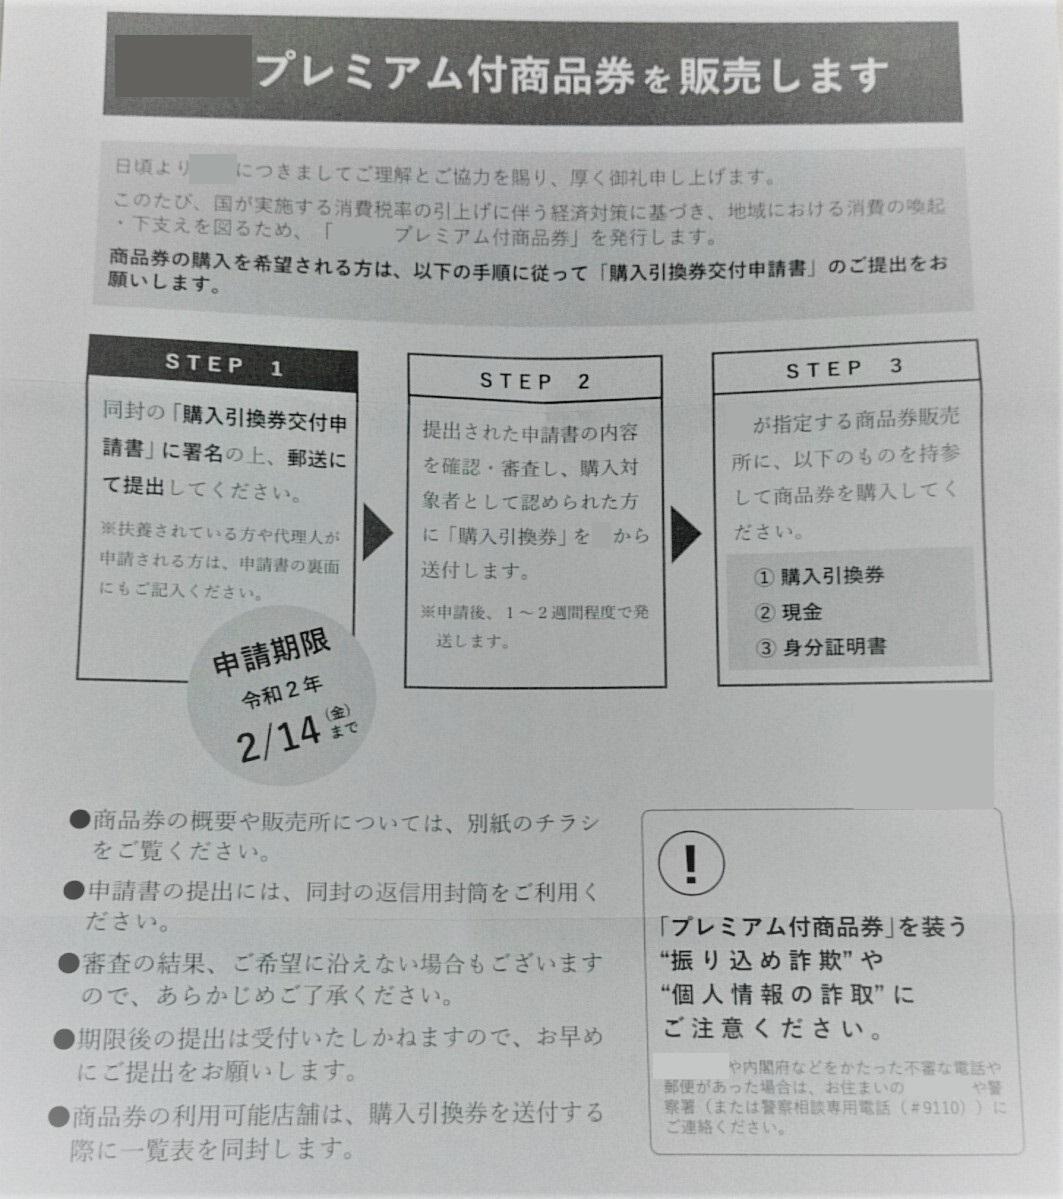 f:id:yotsumao:20190919210205j:plain